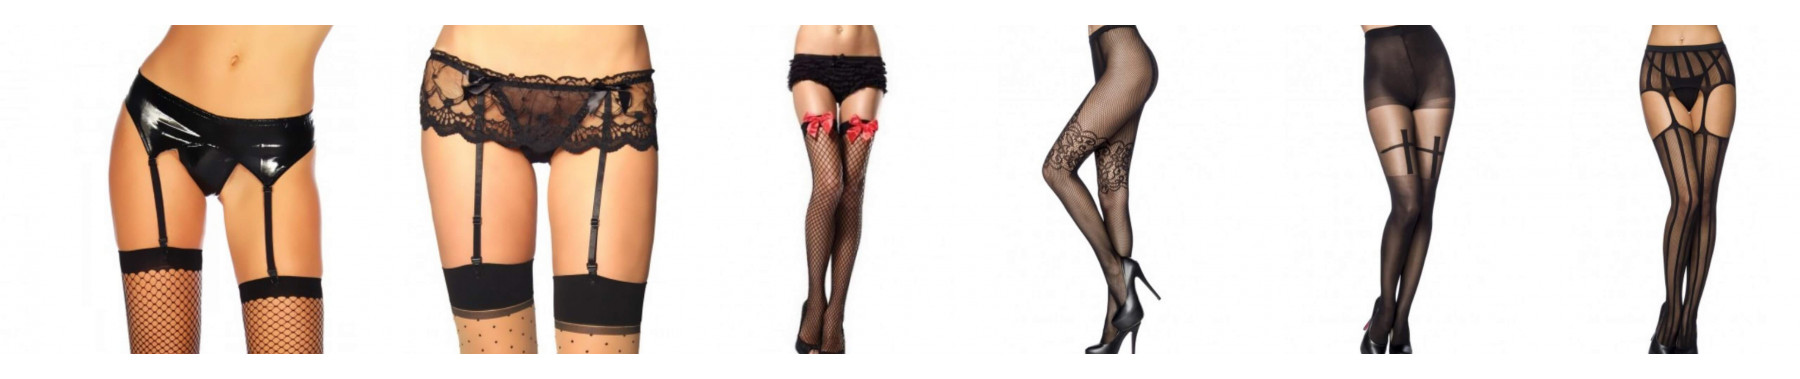 Stockings, garters, pantyhose, pants